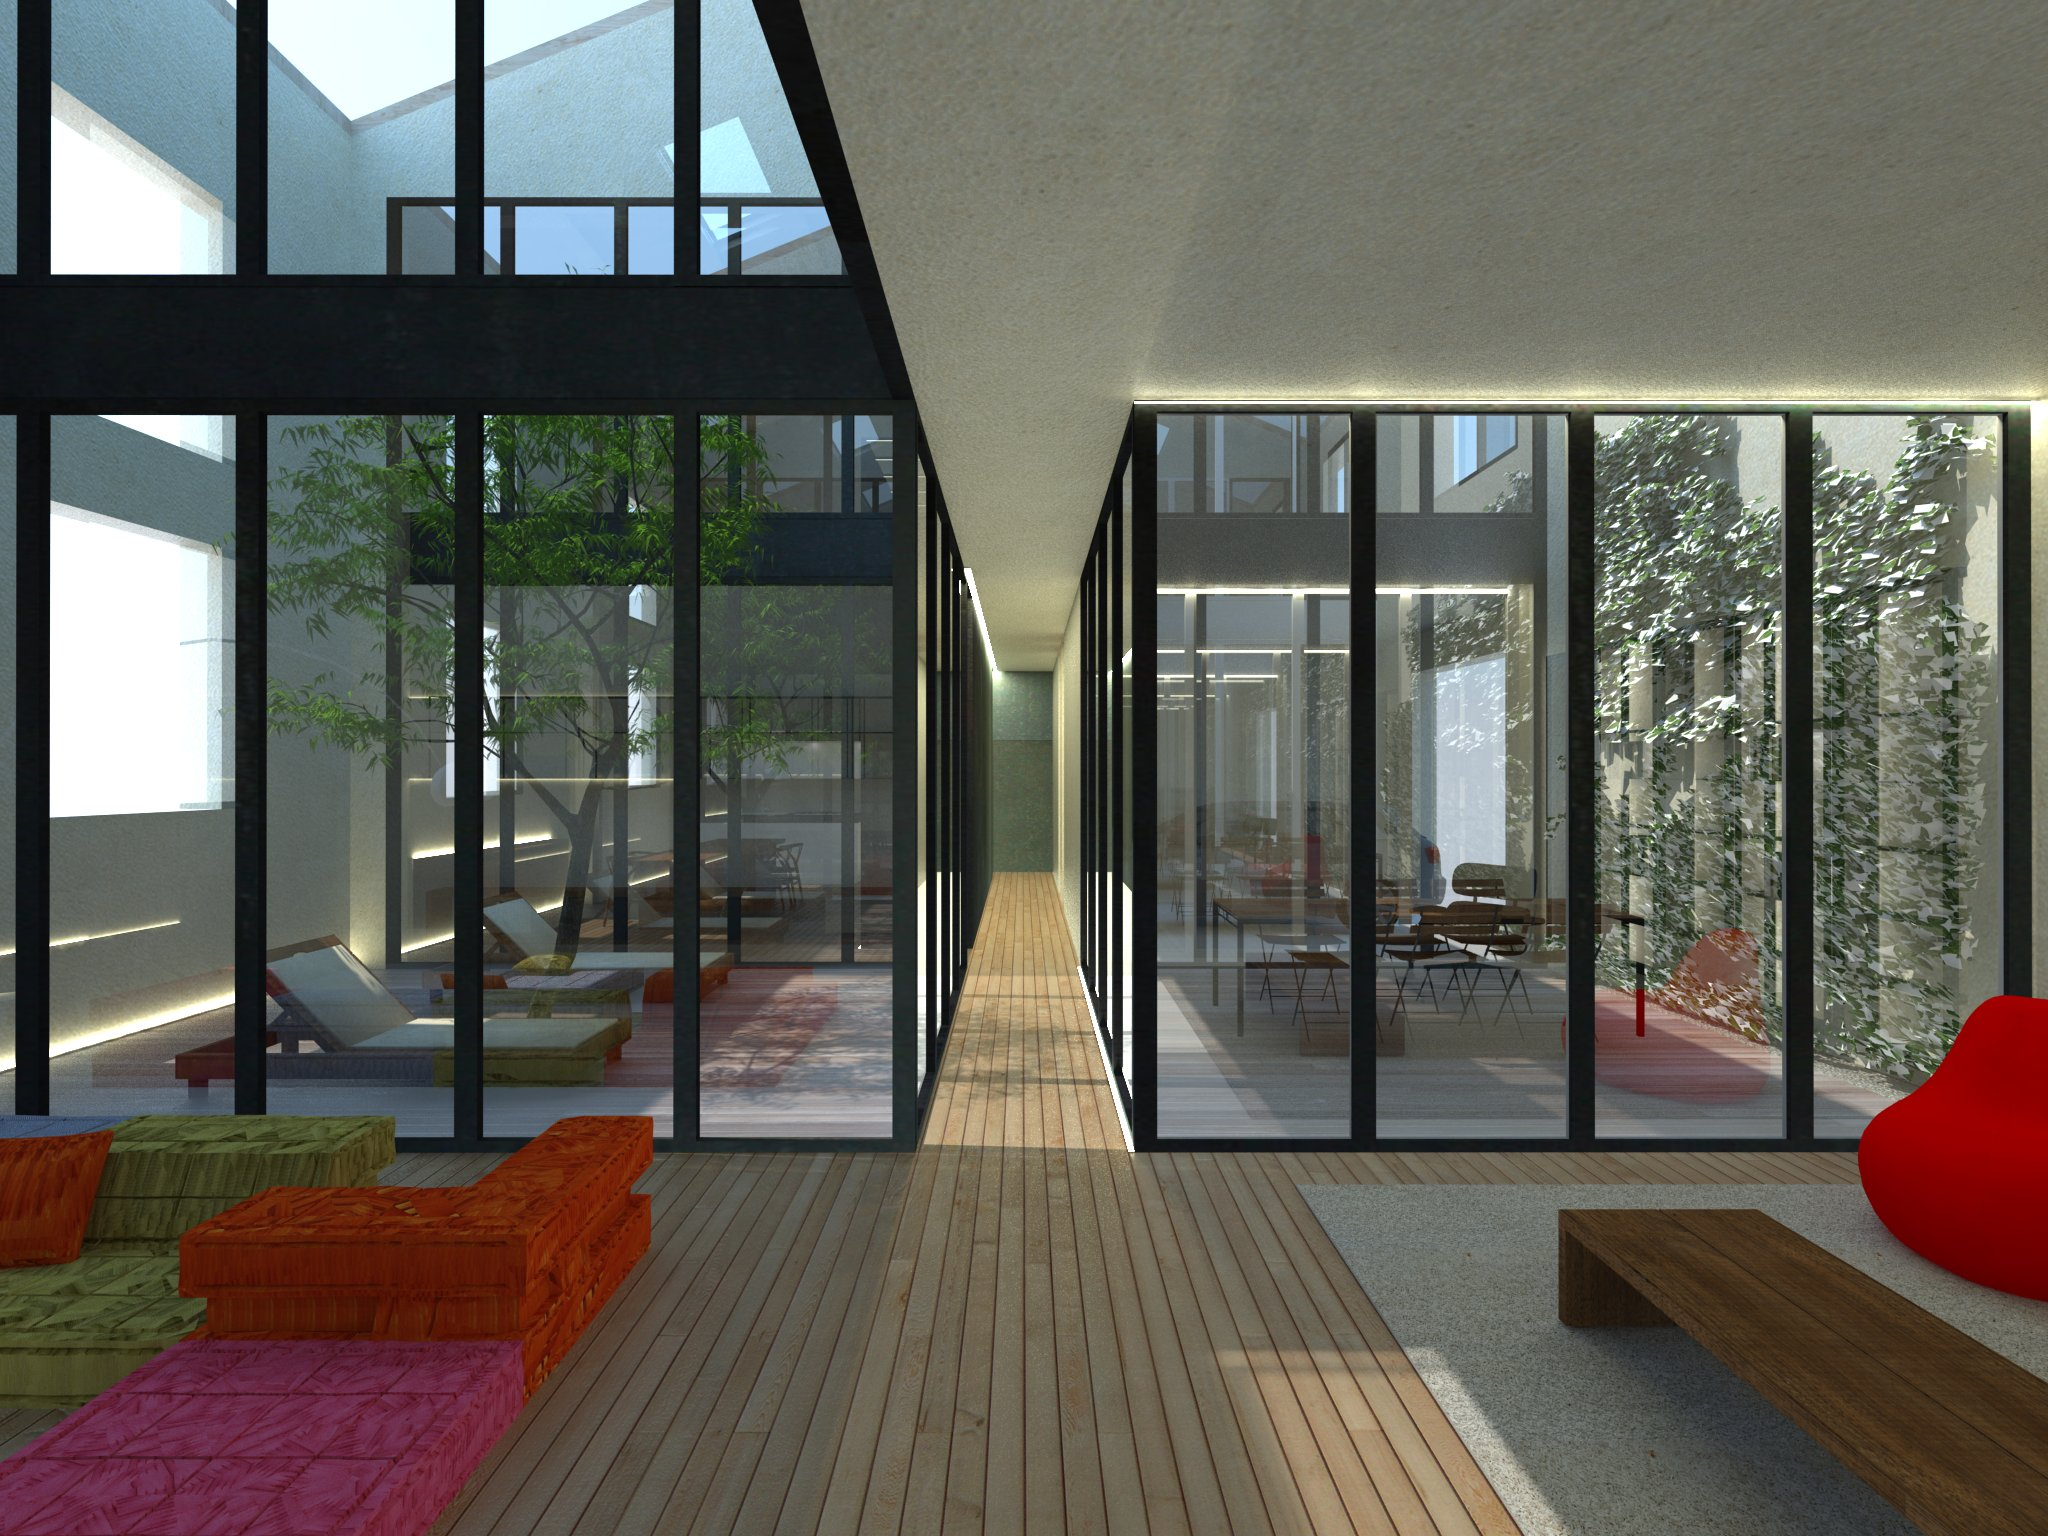 loft cb matteo selleri interior design imola